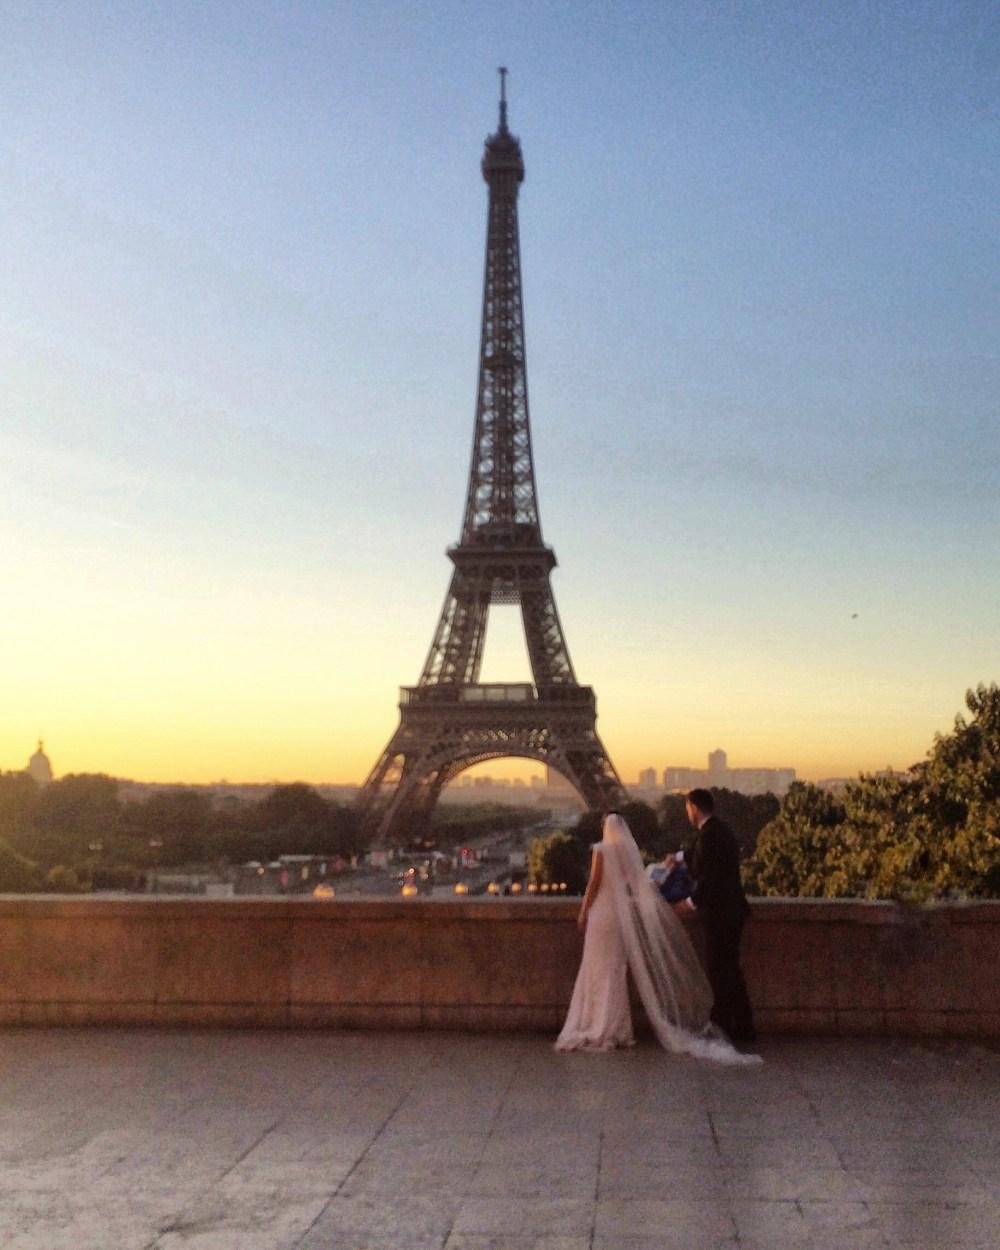 Sunrise in Paris over the Eiffel Tower Vaycarious.com